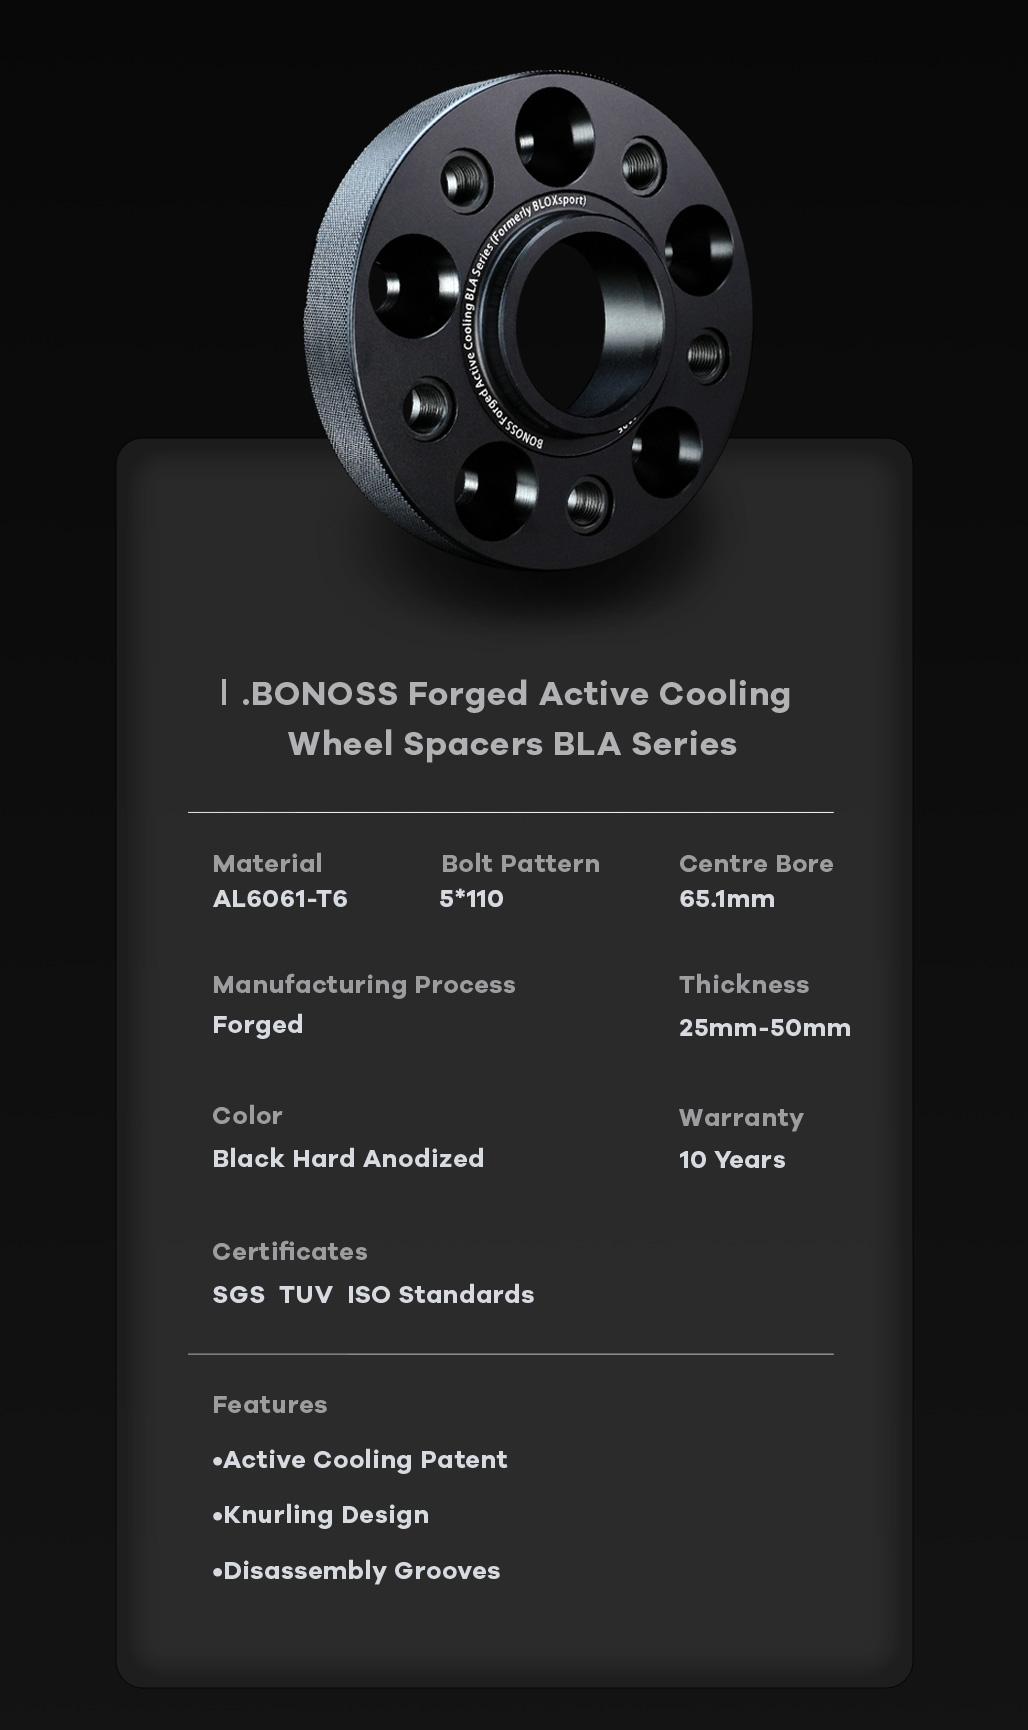 BONOSS-forged-lightweight-plus-wheel-spacer-SAAB-9-3-5x110-65.1-6061T6-M14x1.5-grace-1